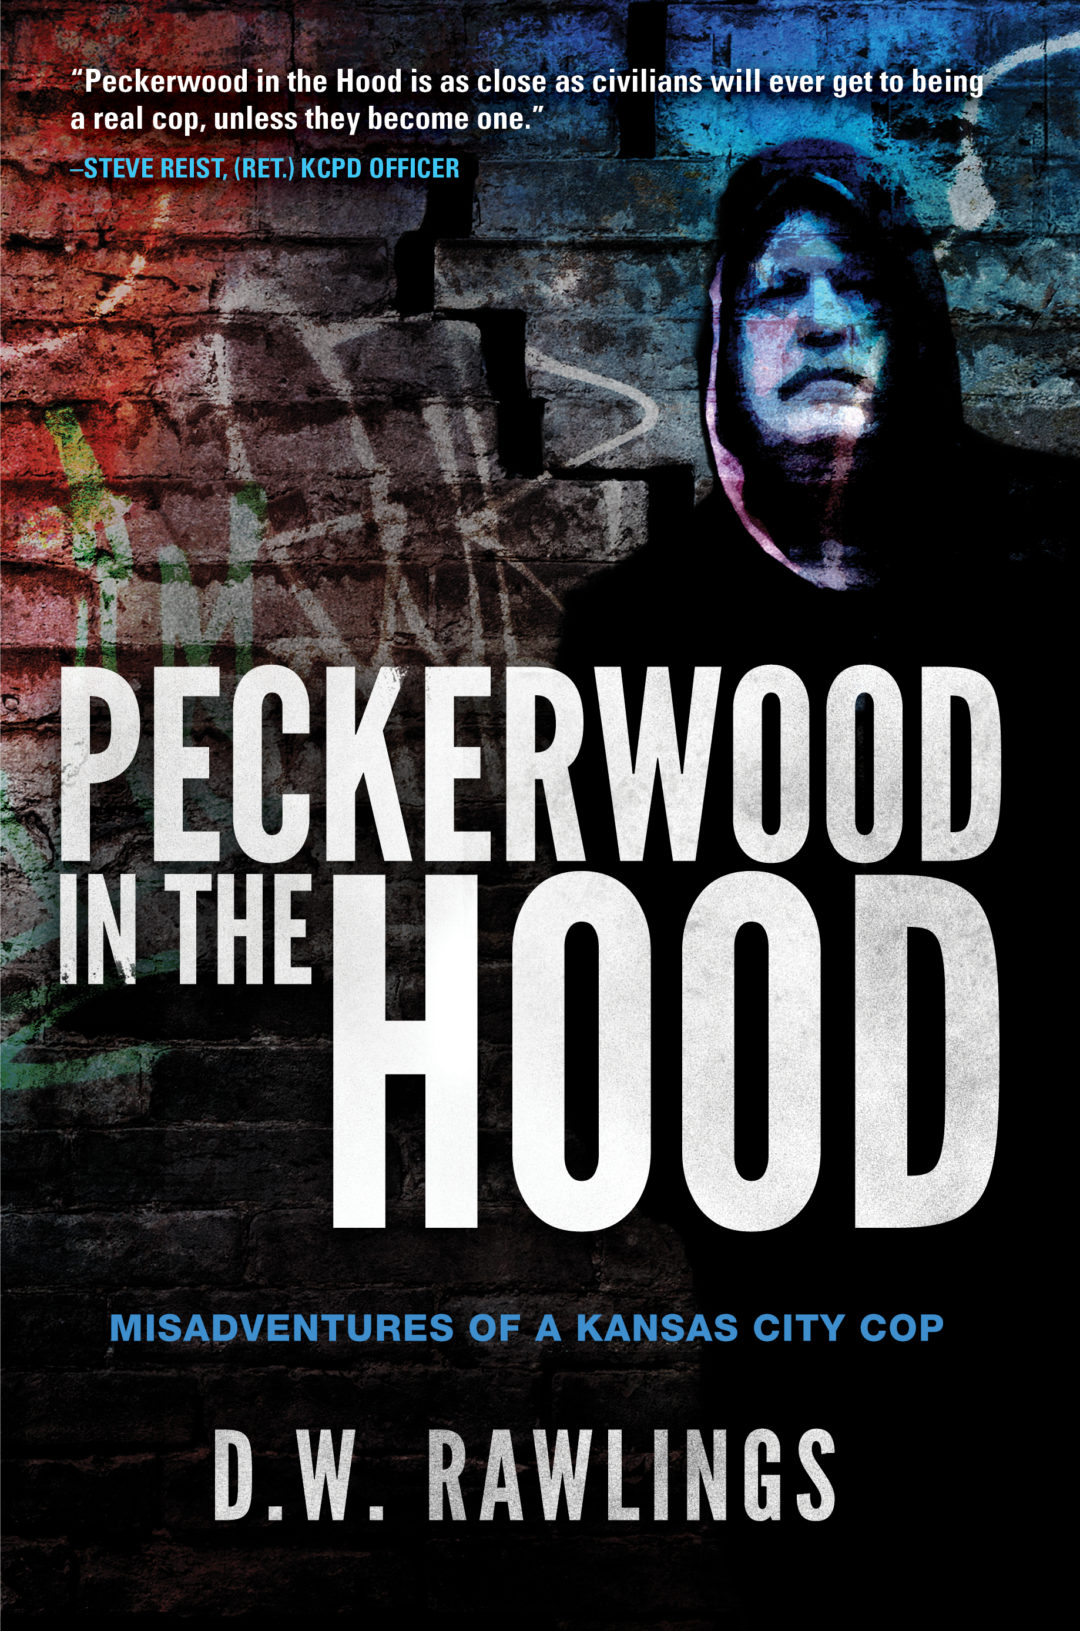 Peckerwood in the Hood